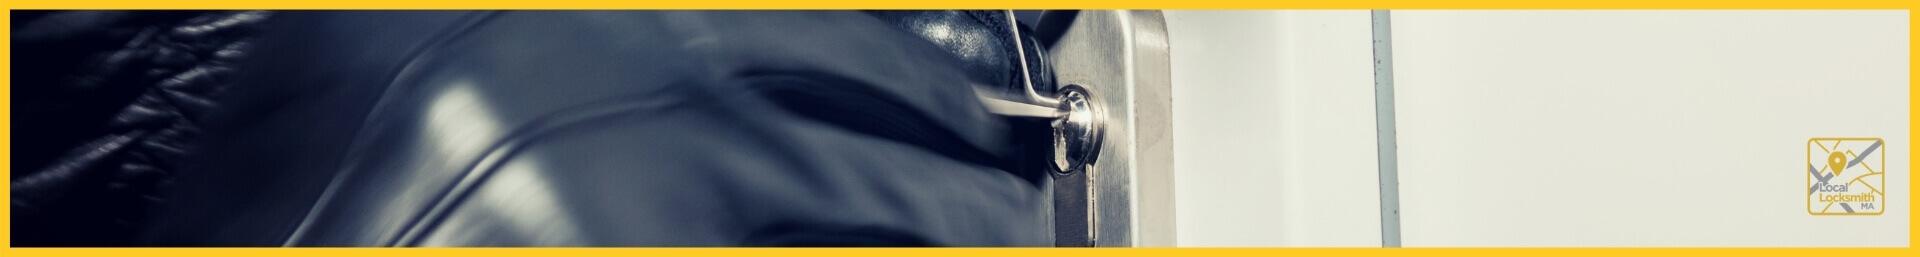 Locksmith Service In Salem